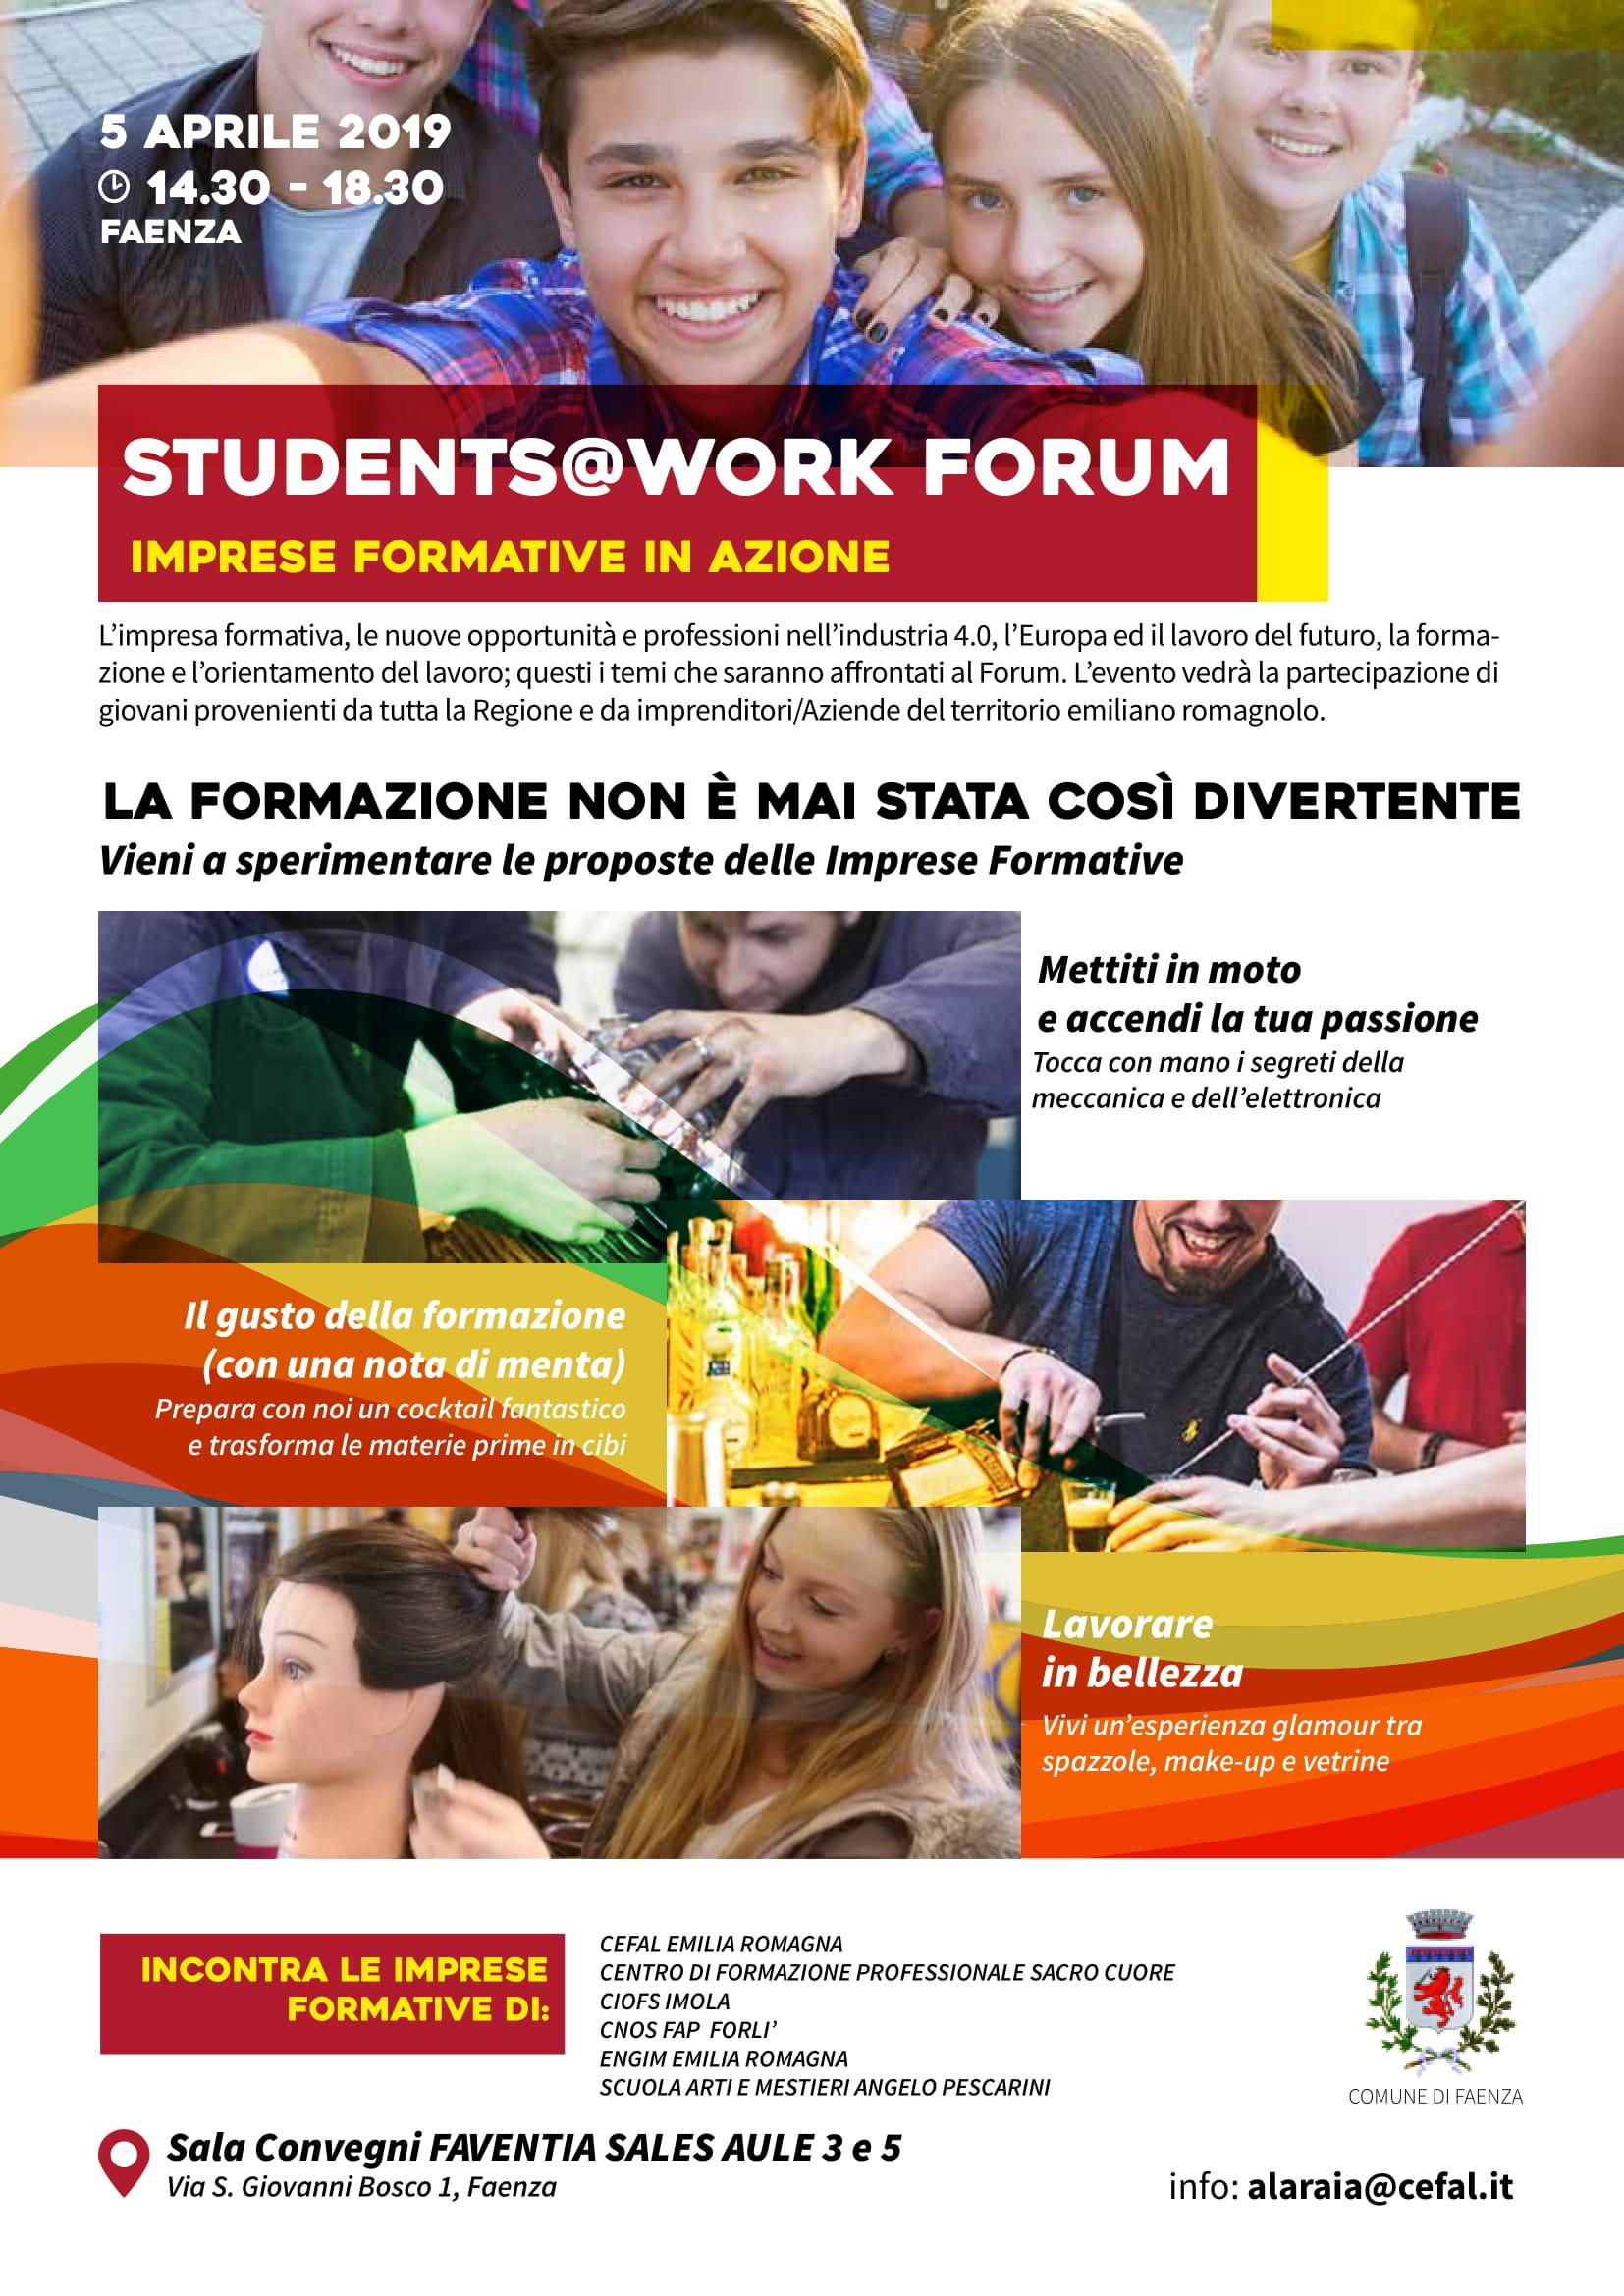 5.4.19 - Students@work venerdì-1